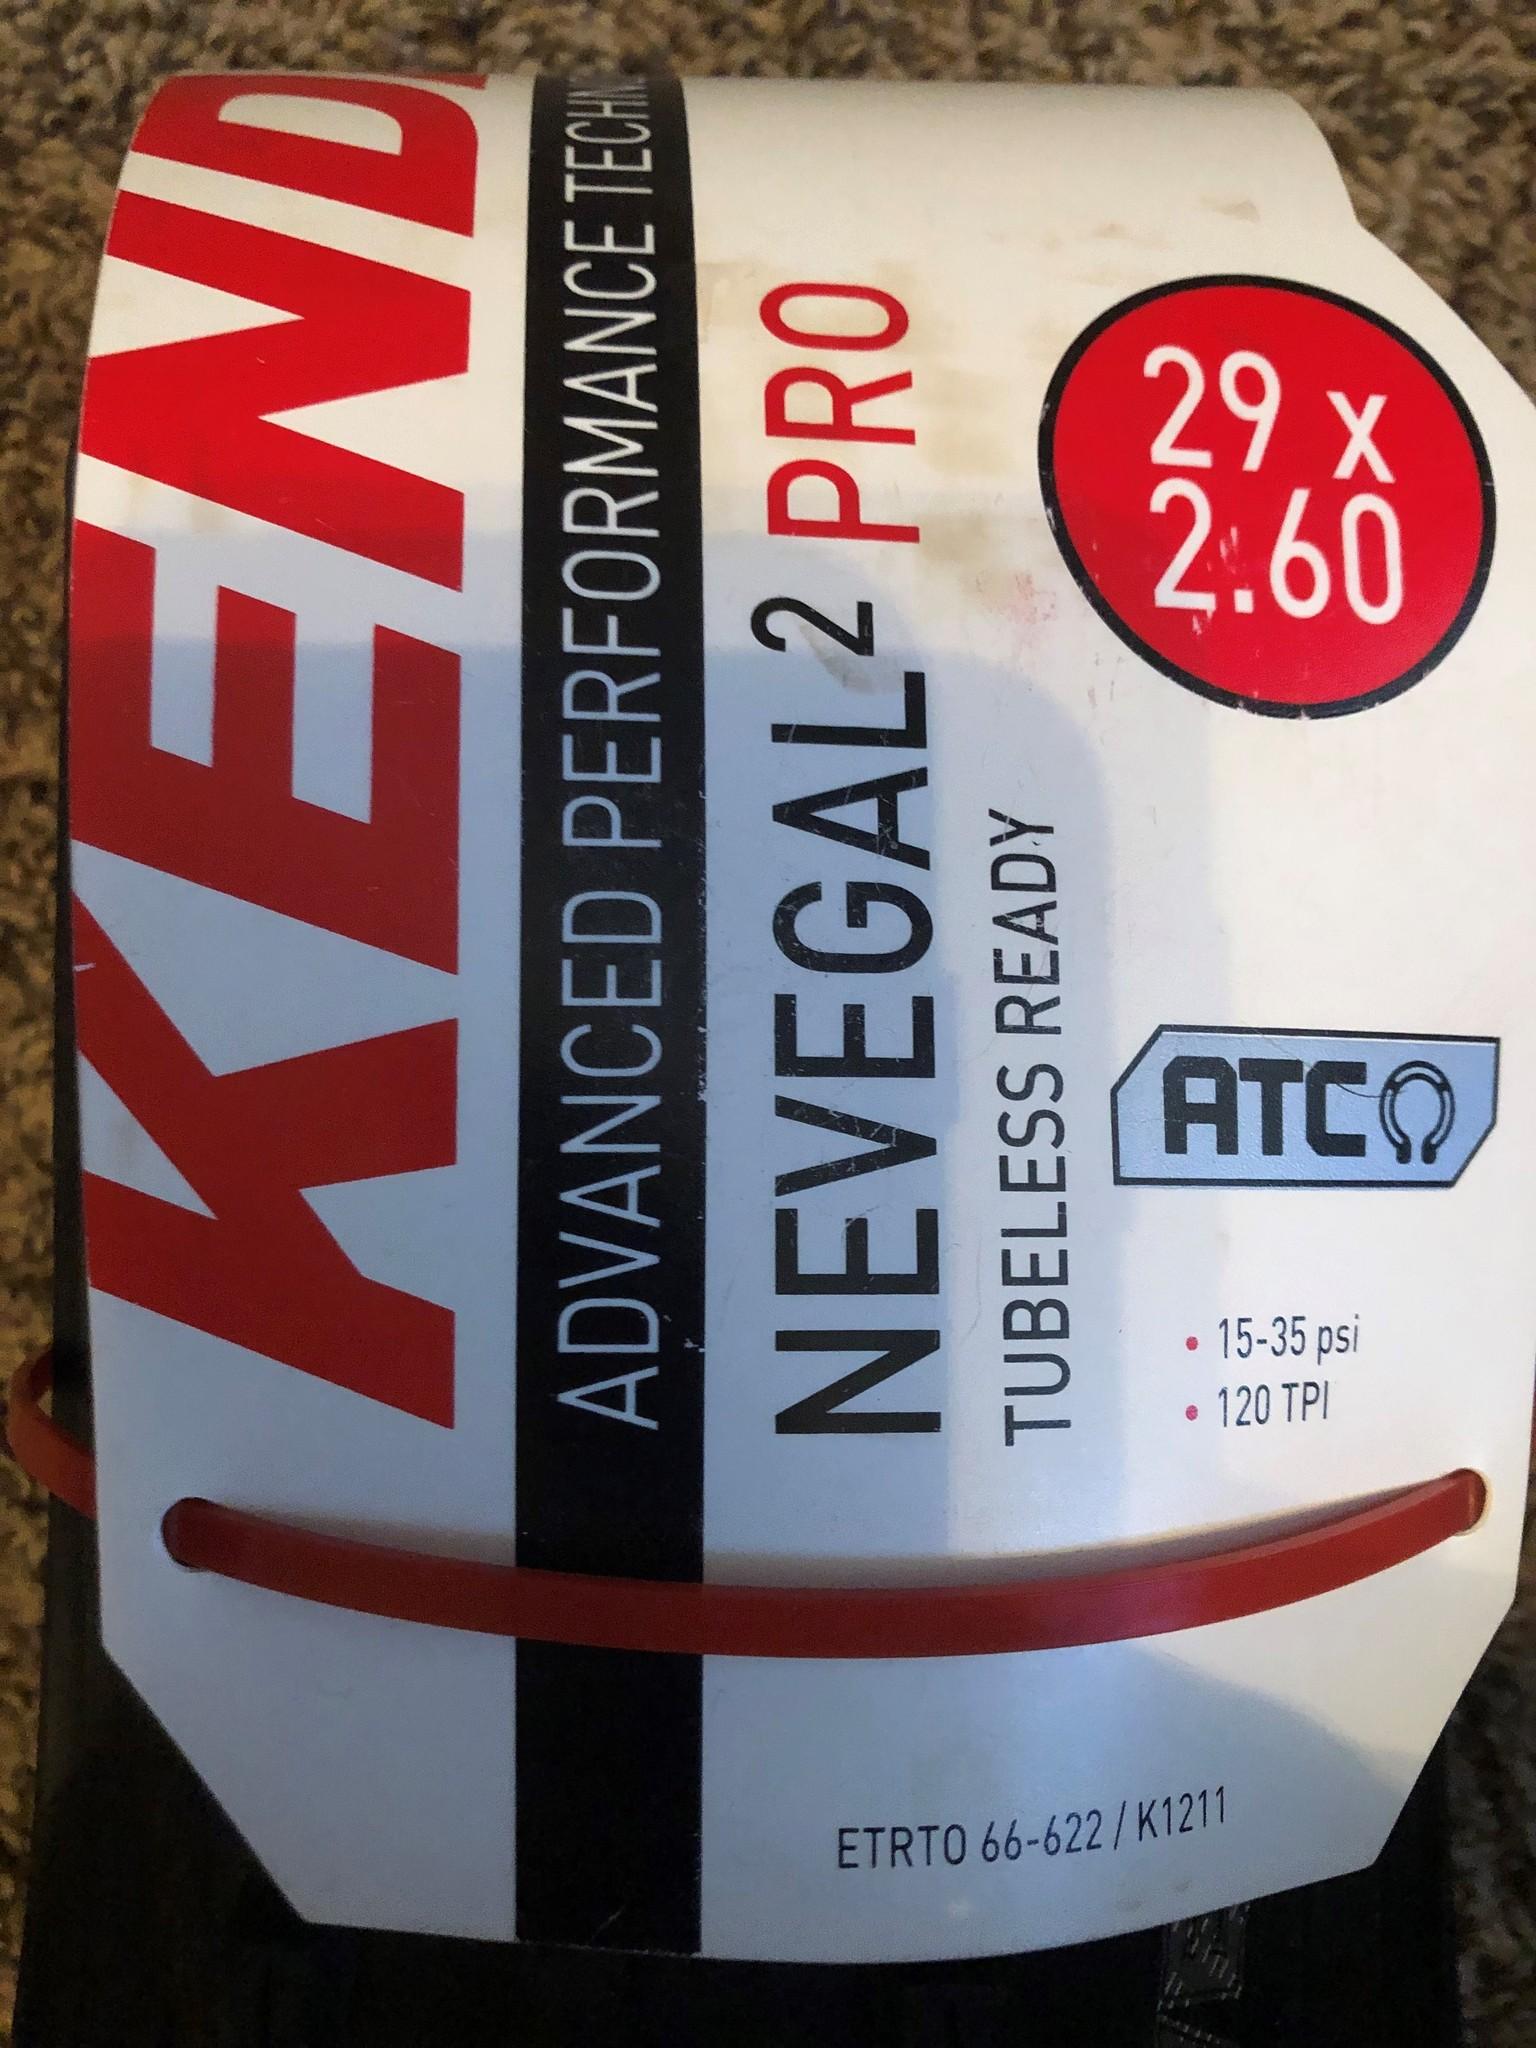 Kenda Nevegal 2 Pro Tire - 29x2.6-1